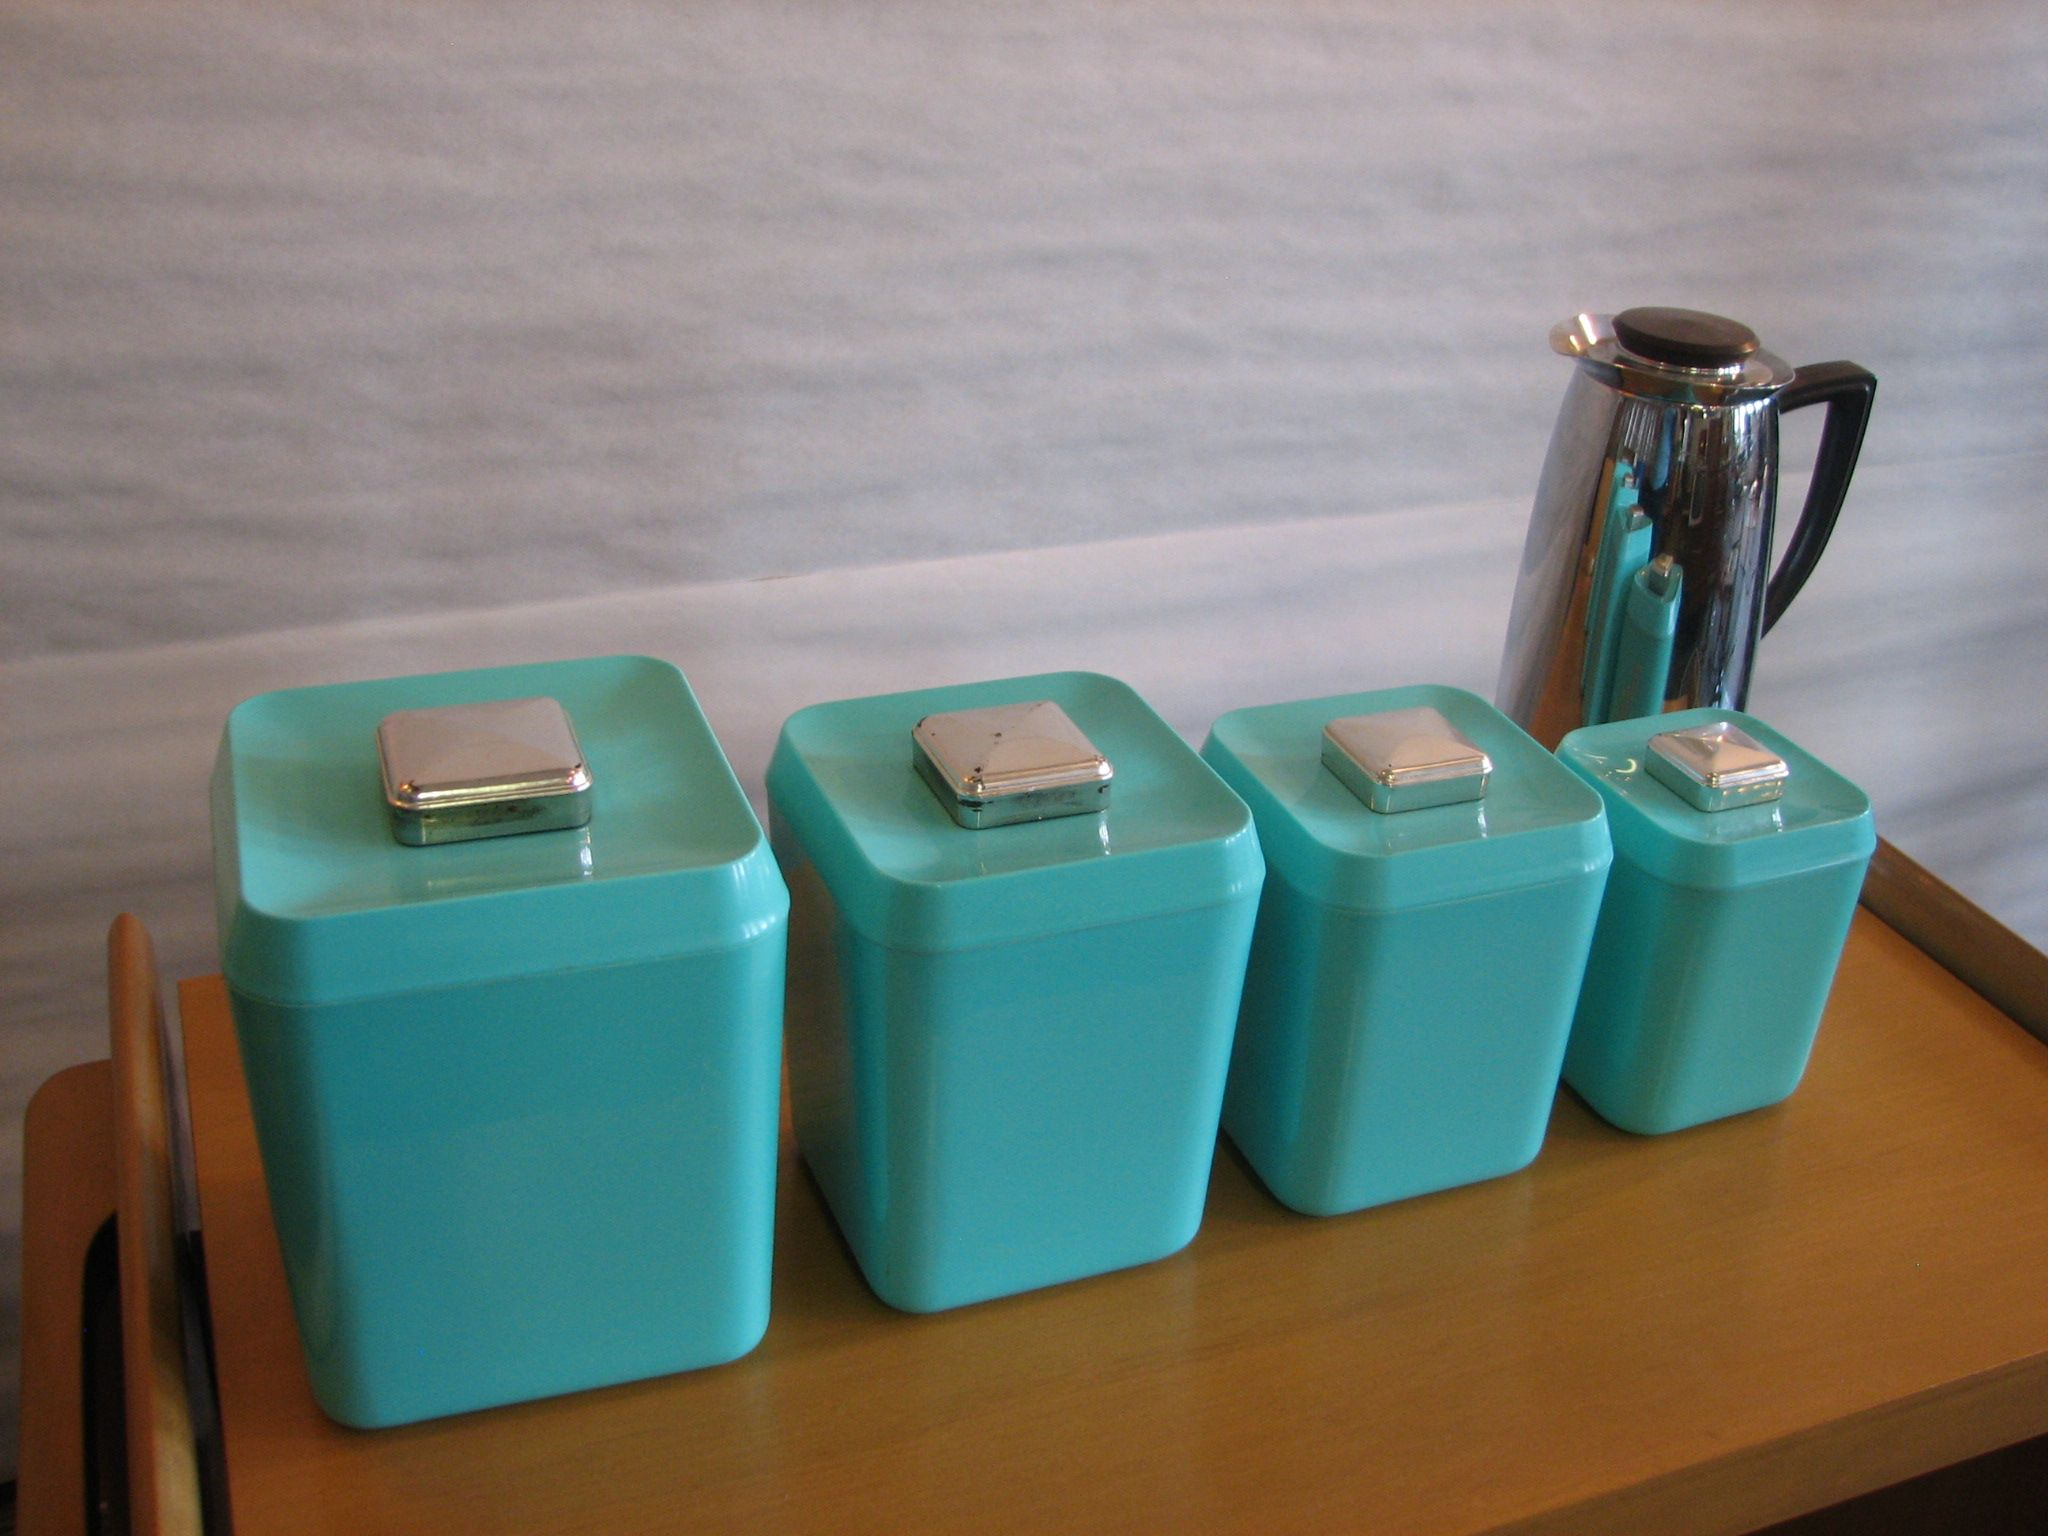 Turquoise kitchen canister set pinterest turquoise kitchen